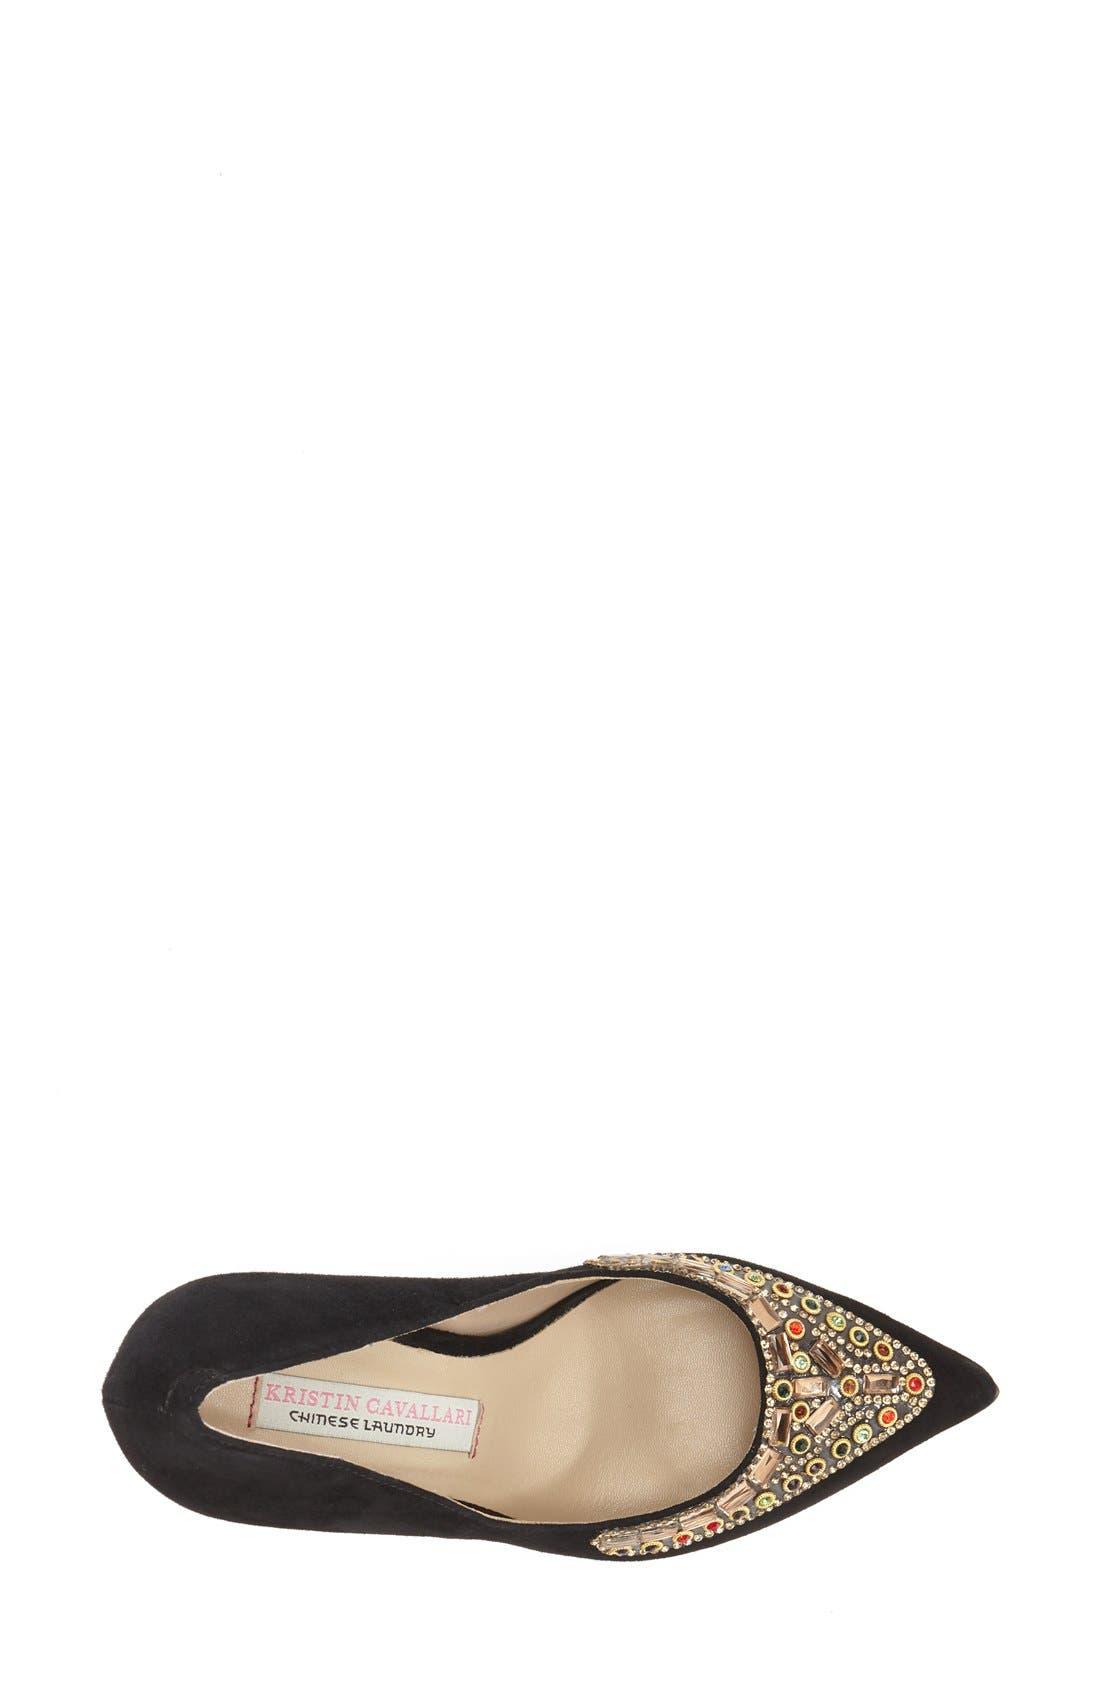 Alternate Image 3  - Kristin Cavallari 'Dani' Embellished Pointy Toe Pump (Women)